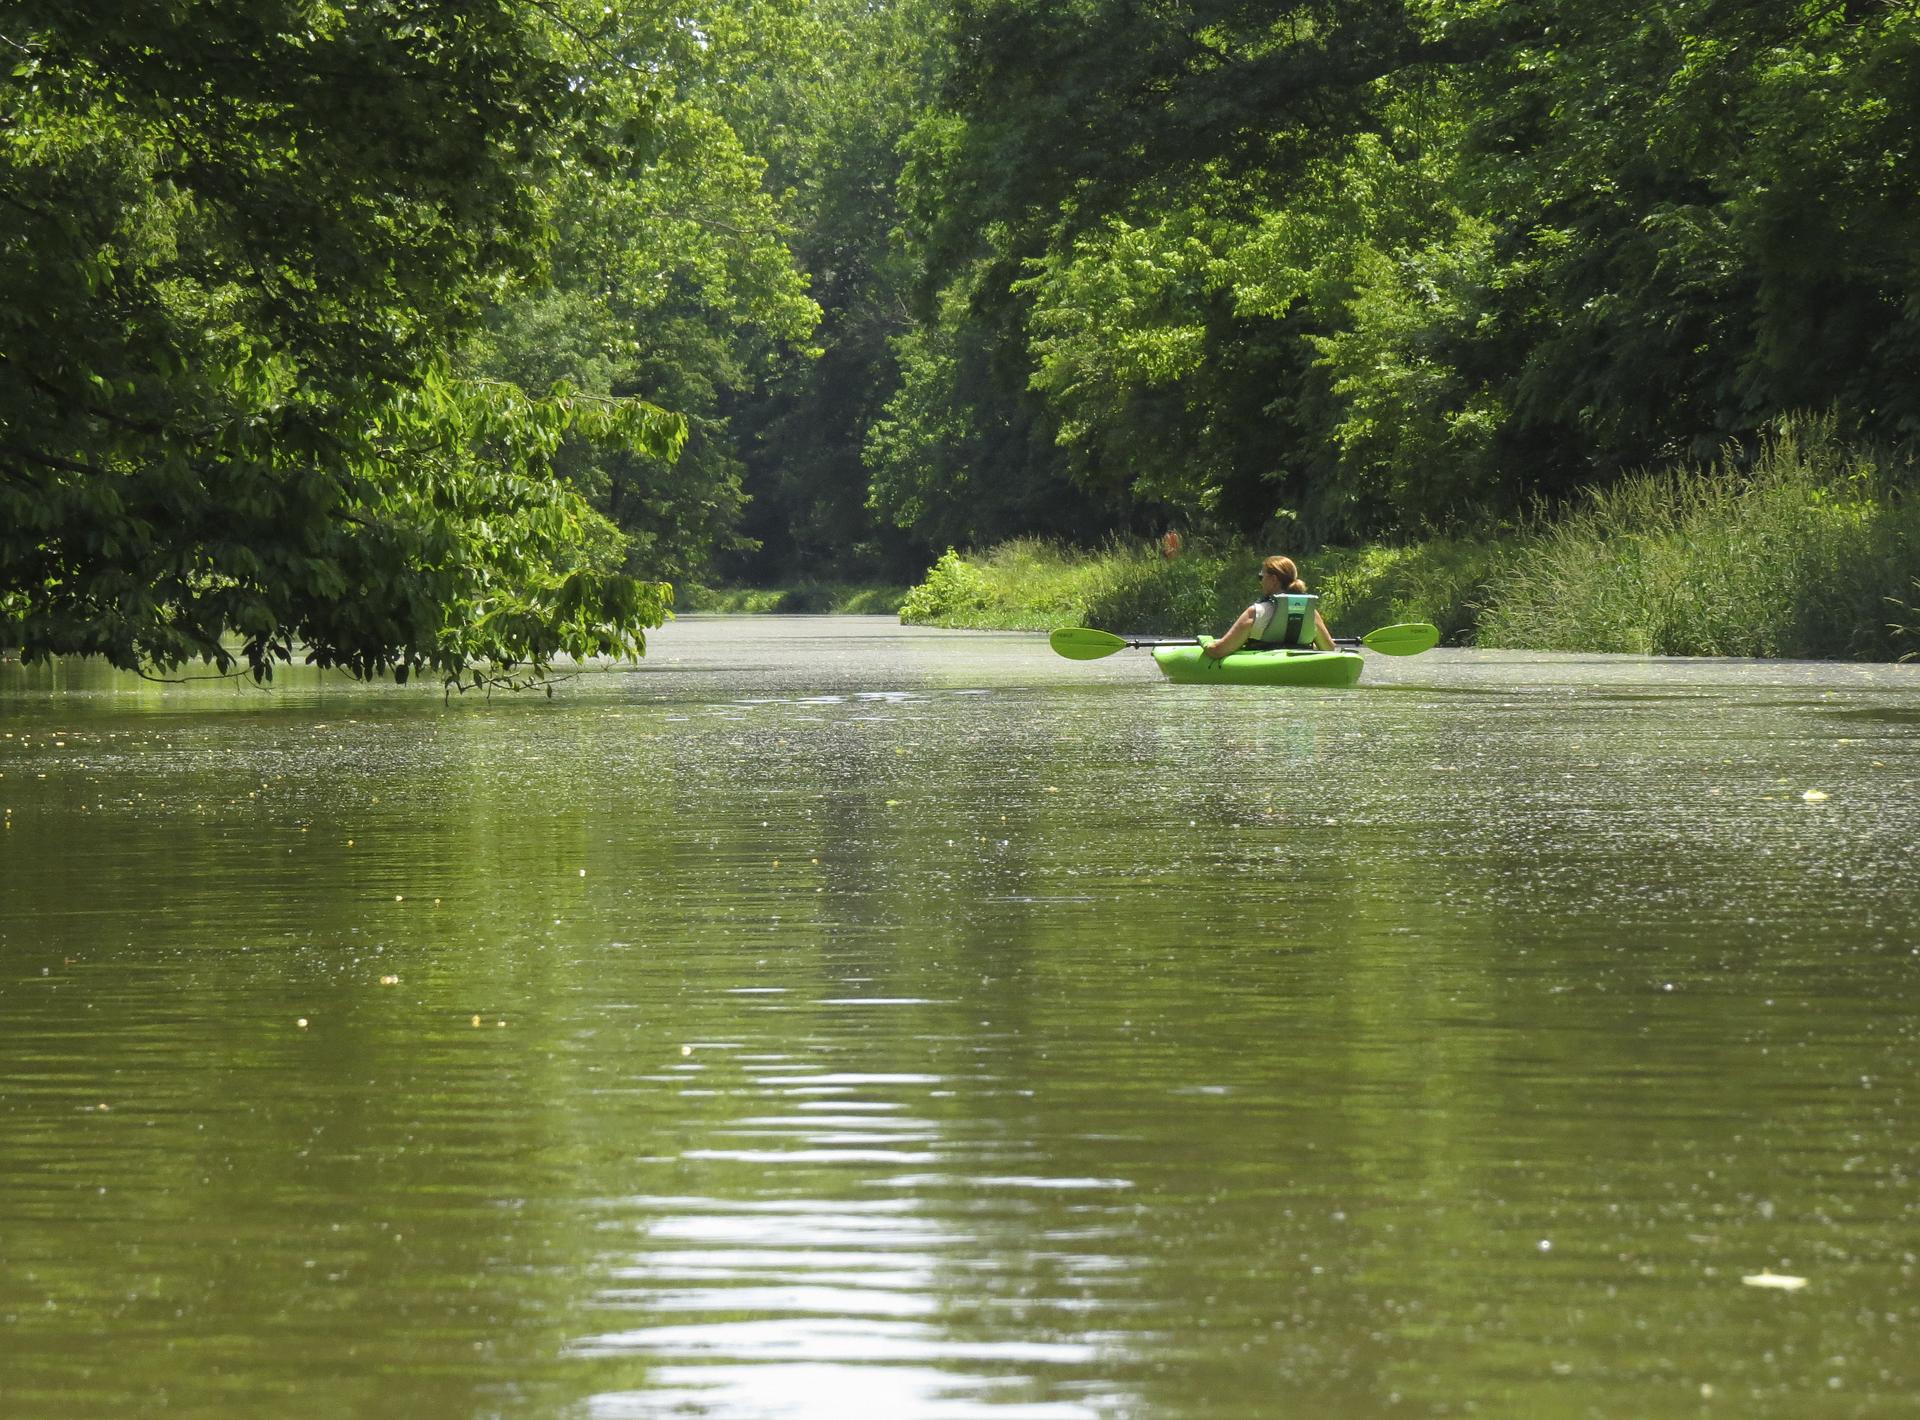 kayaking-kayaking-maryland-ourdoors-women-nature-outdoors-c&o-canal-potomac-river